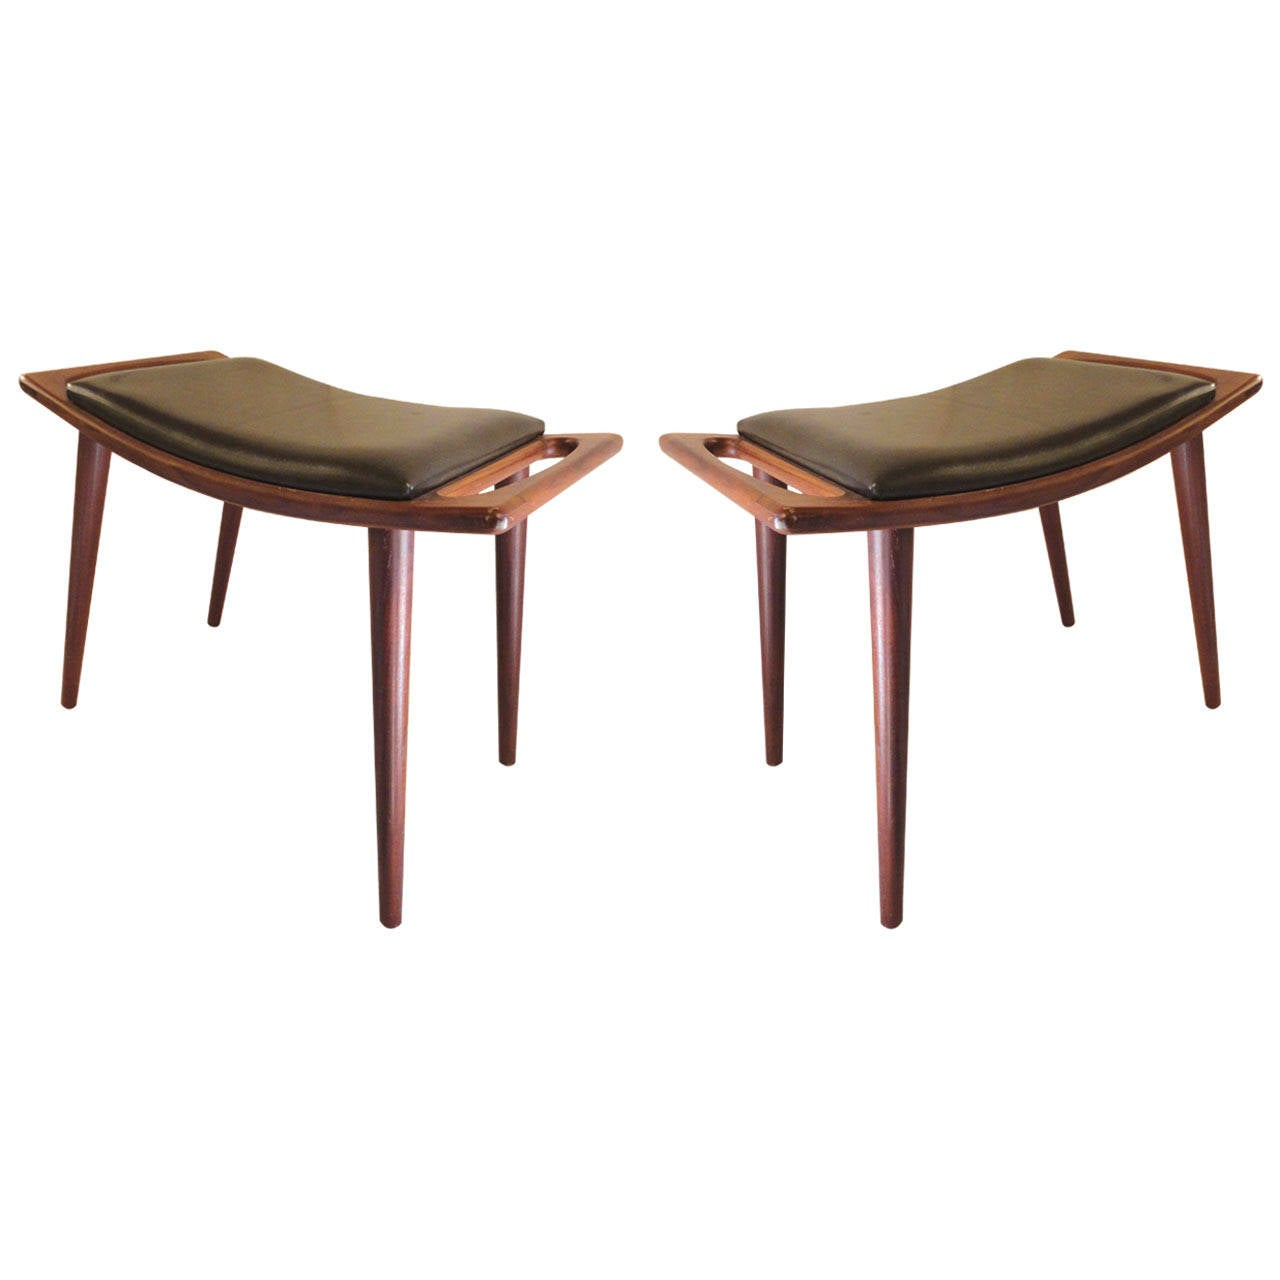 hans wegner mid century modern stool at 1stdibs. Black Bedroom Furniture Sets. Home Design Ideas